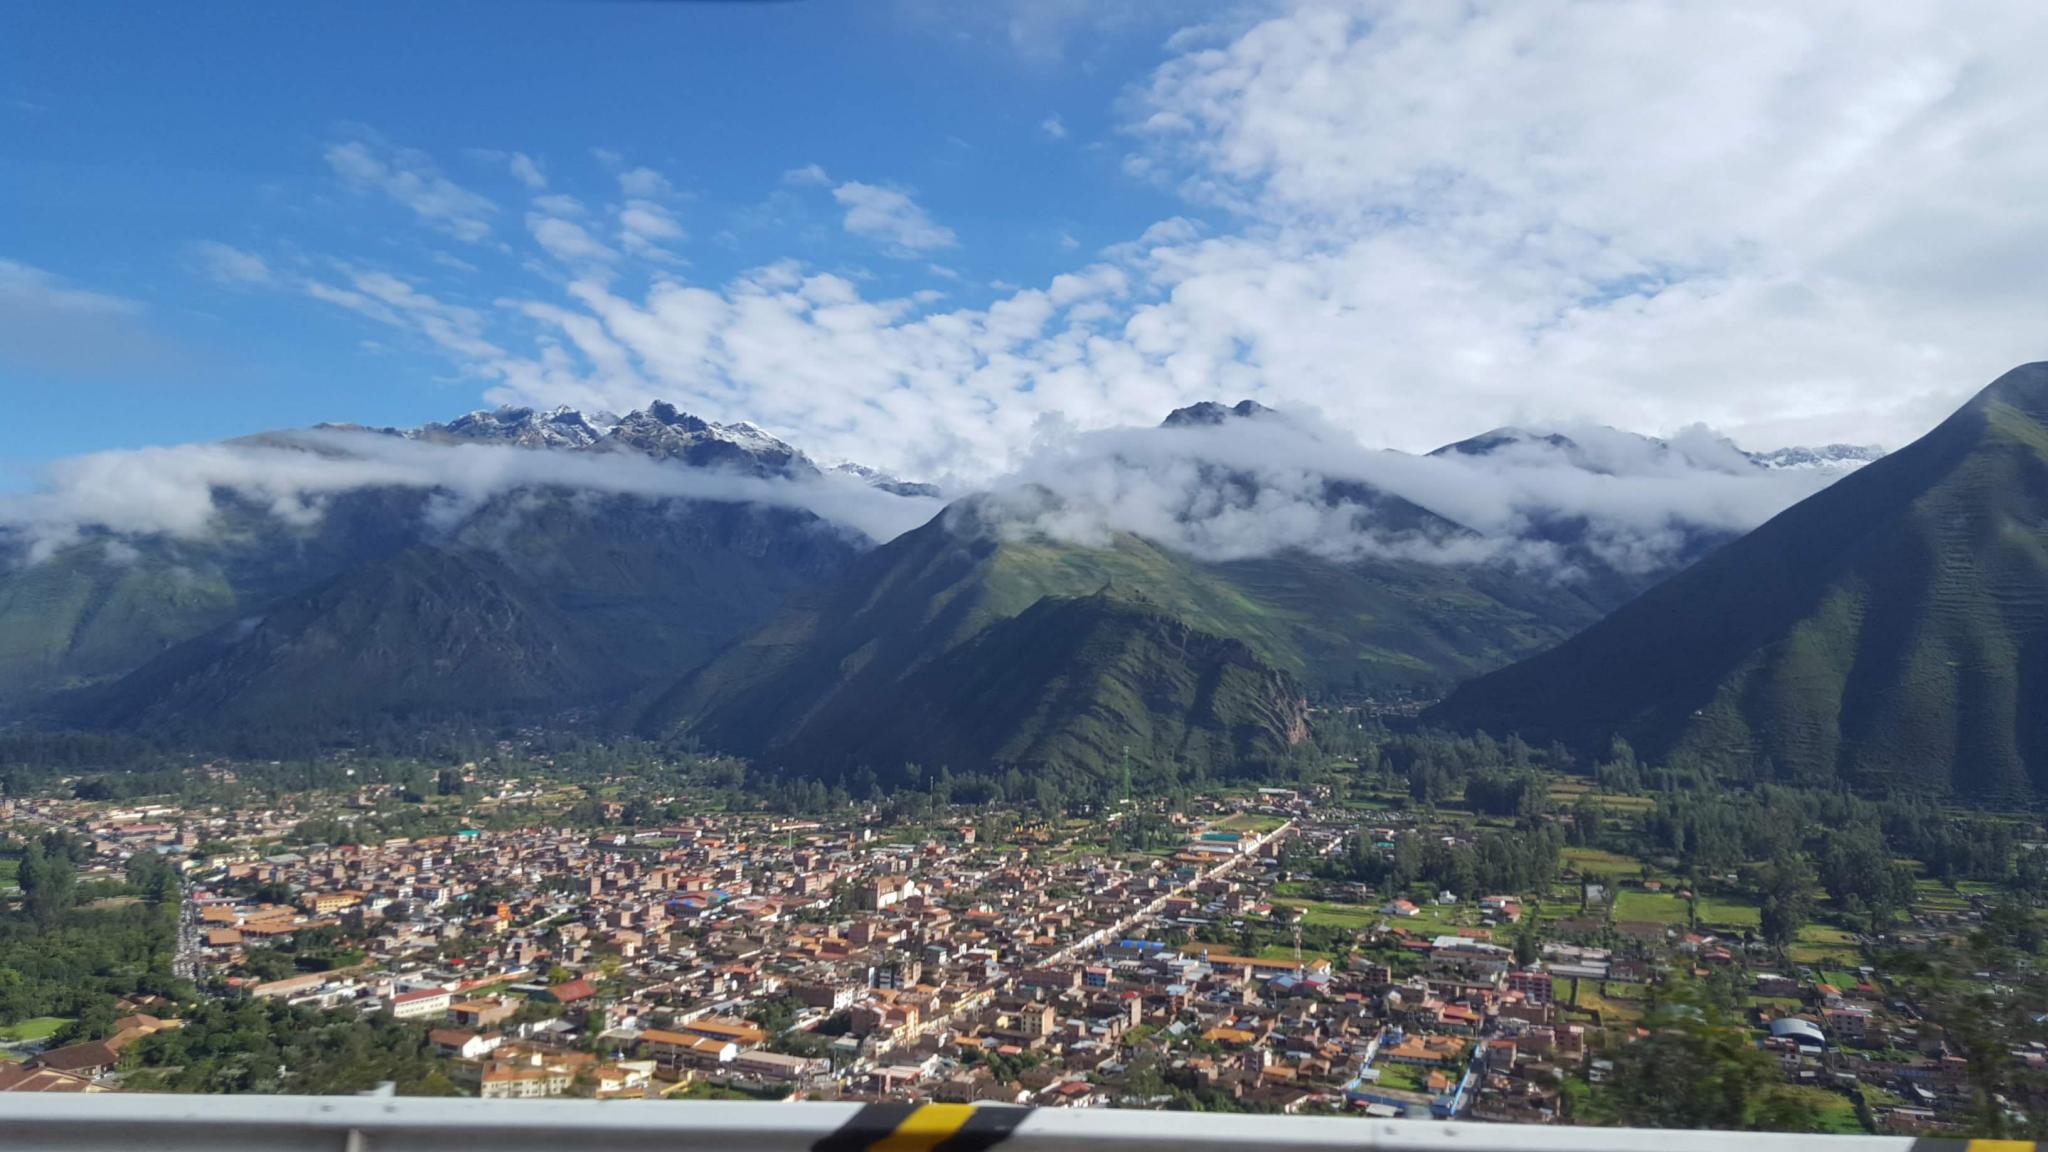 Peru: Lima, Cusco and Machu Picchu-mountains-olo-jpg